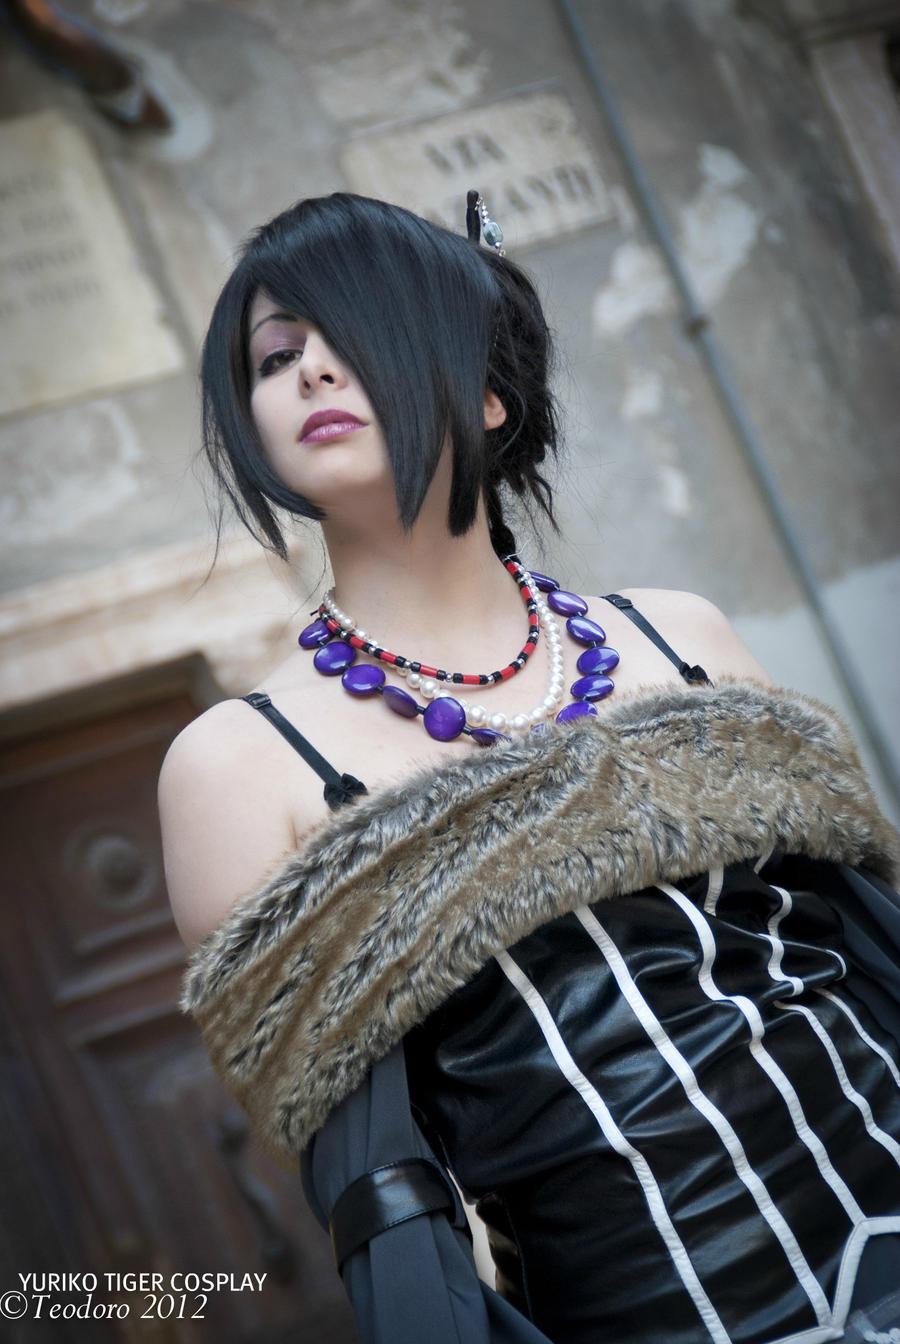 Lulu final fantasy X cosplay by YurikoTiger